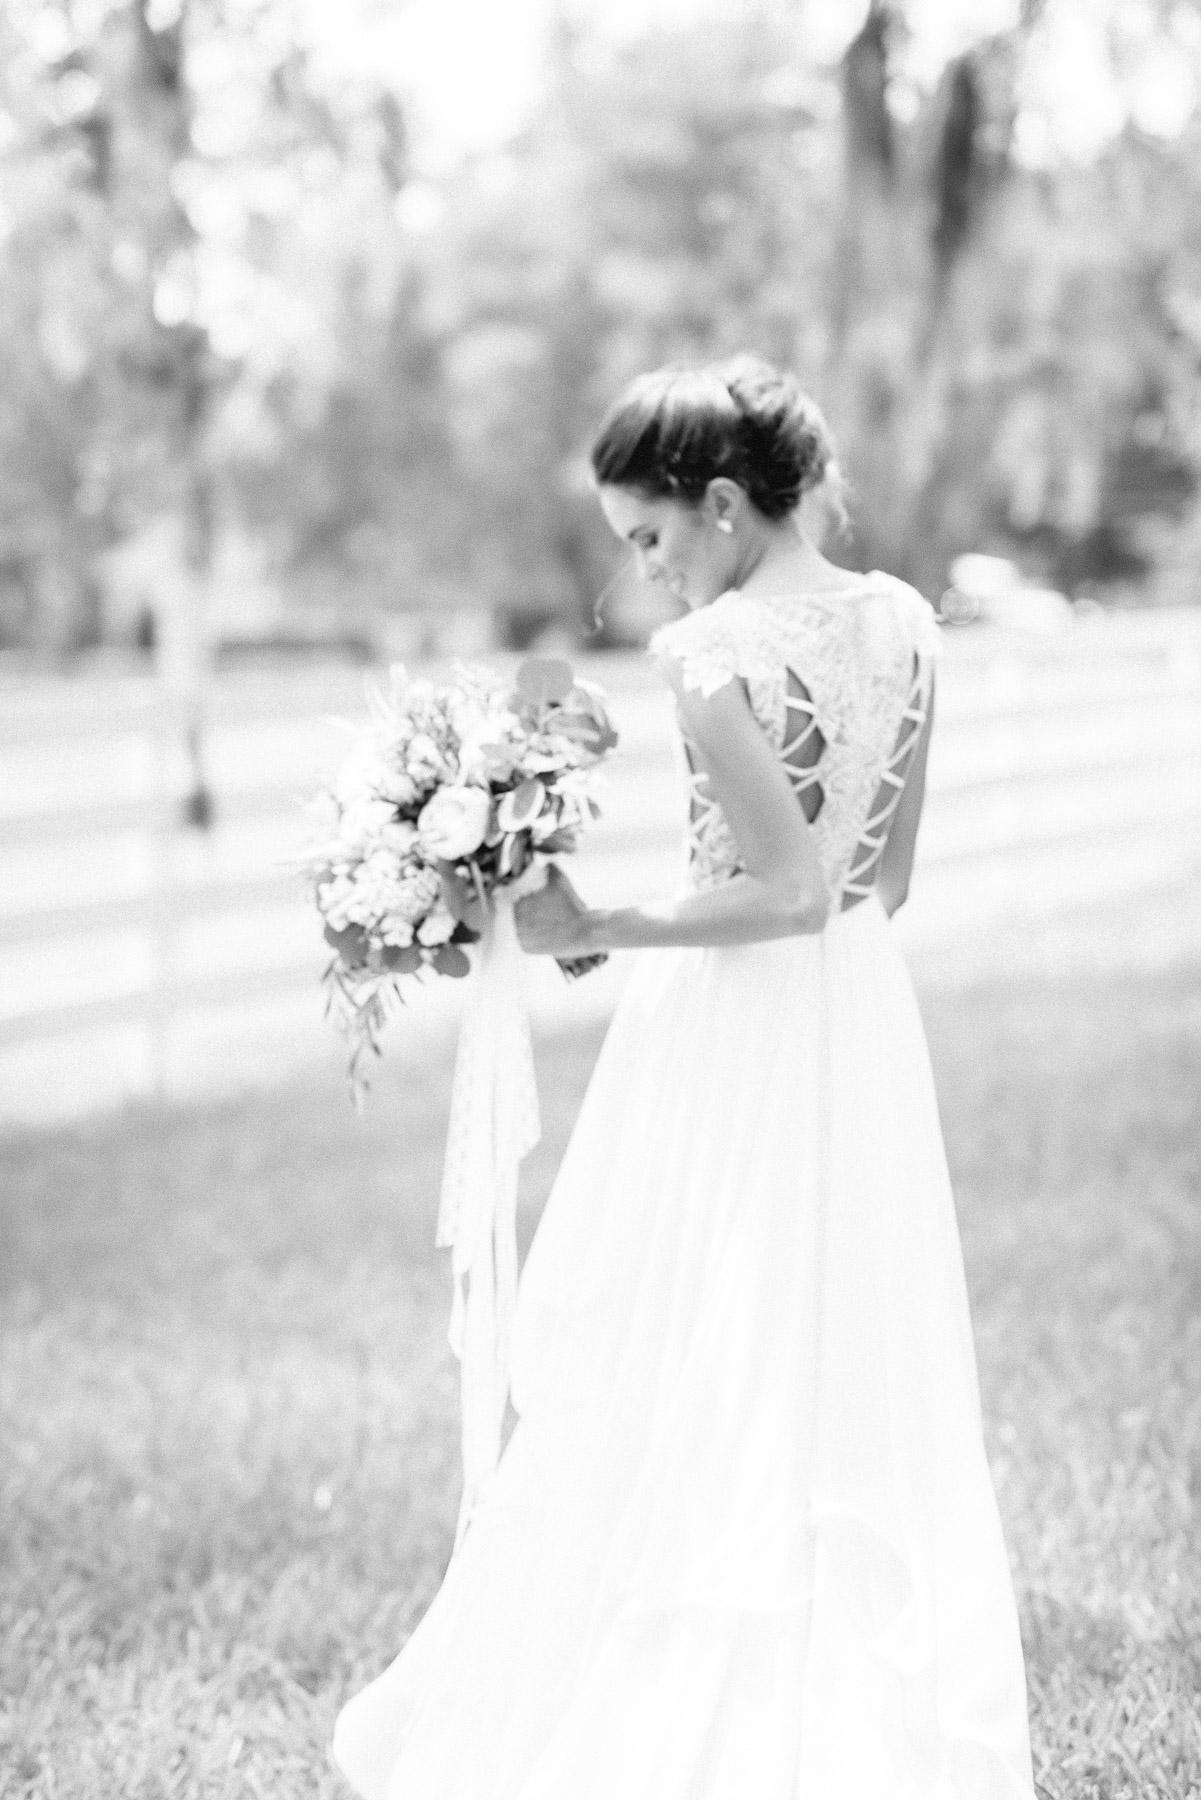 KateTaramykinStudios-Portfolio-Weddings-HighlandManor-1.jpg